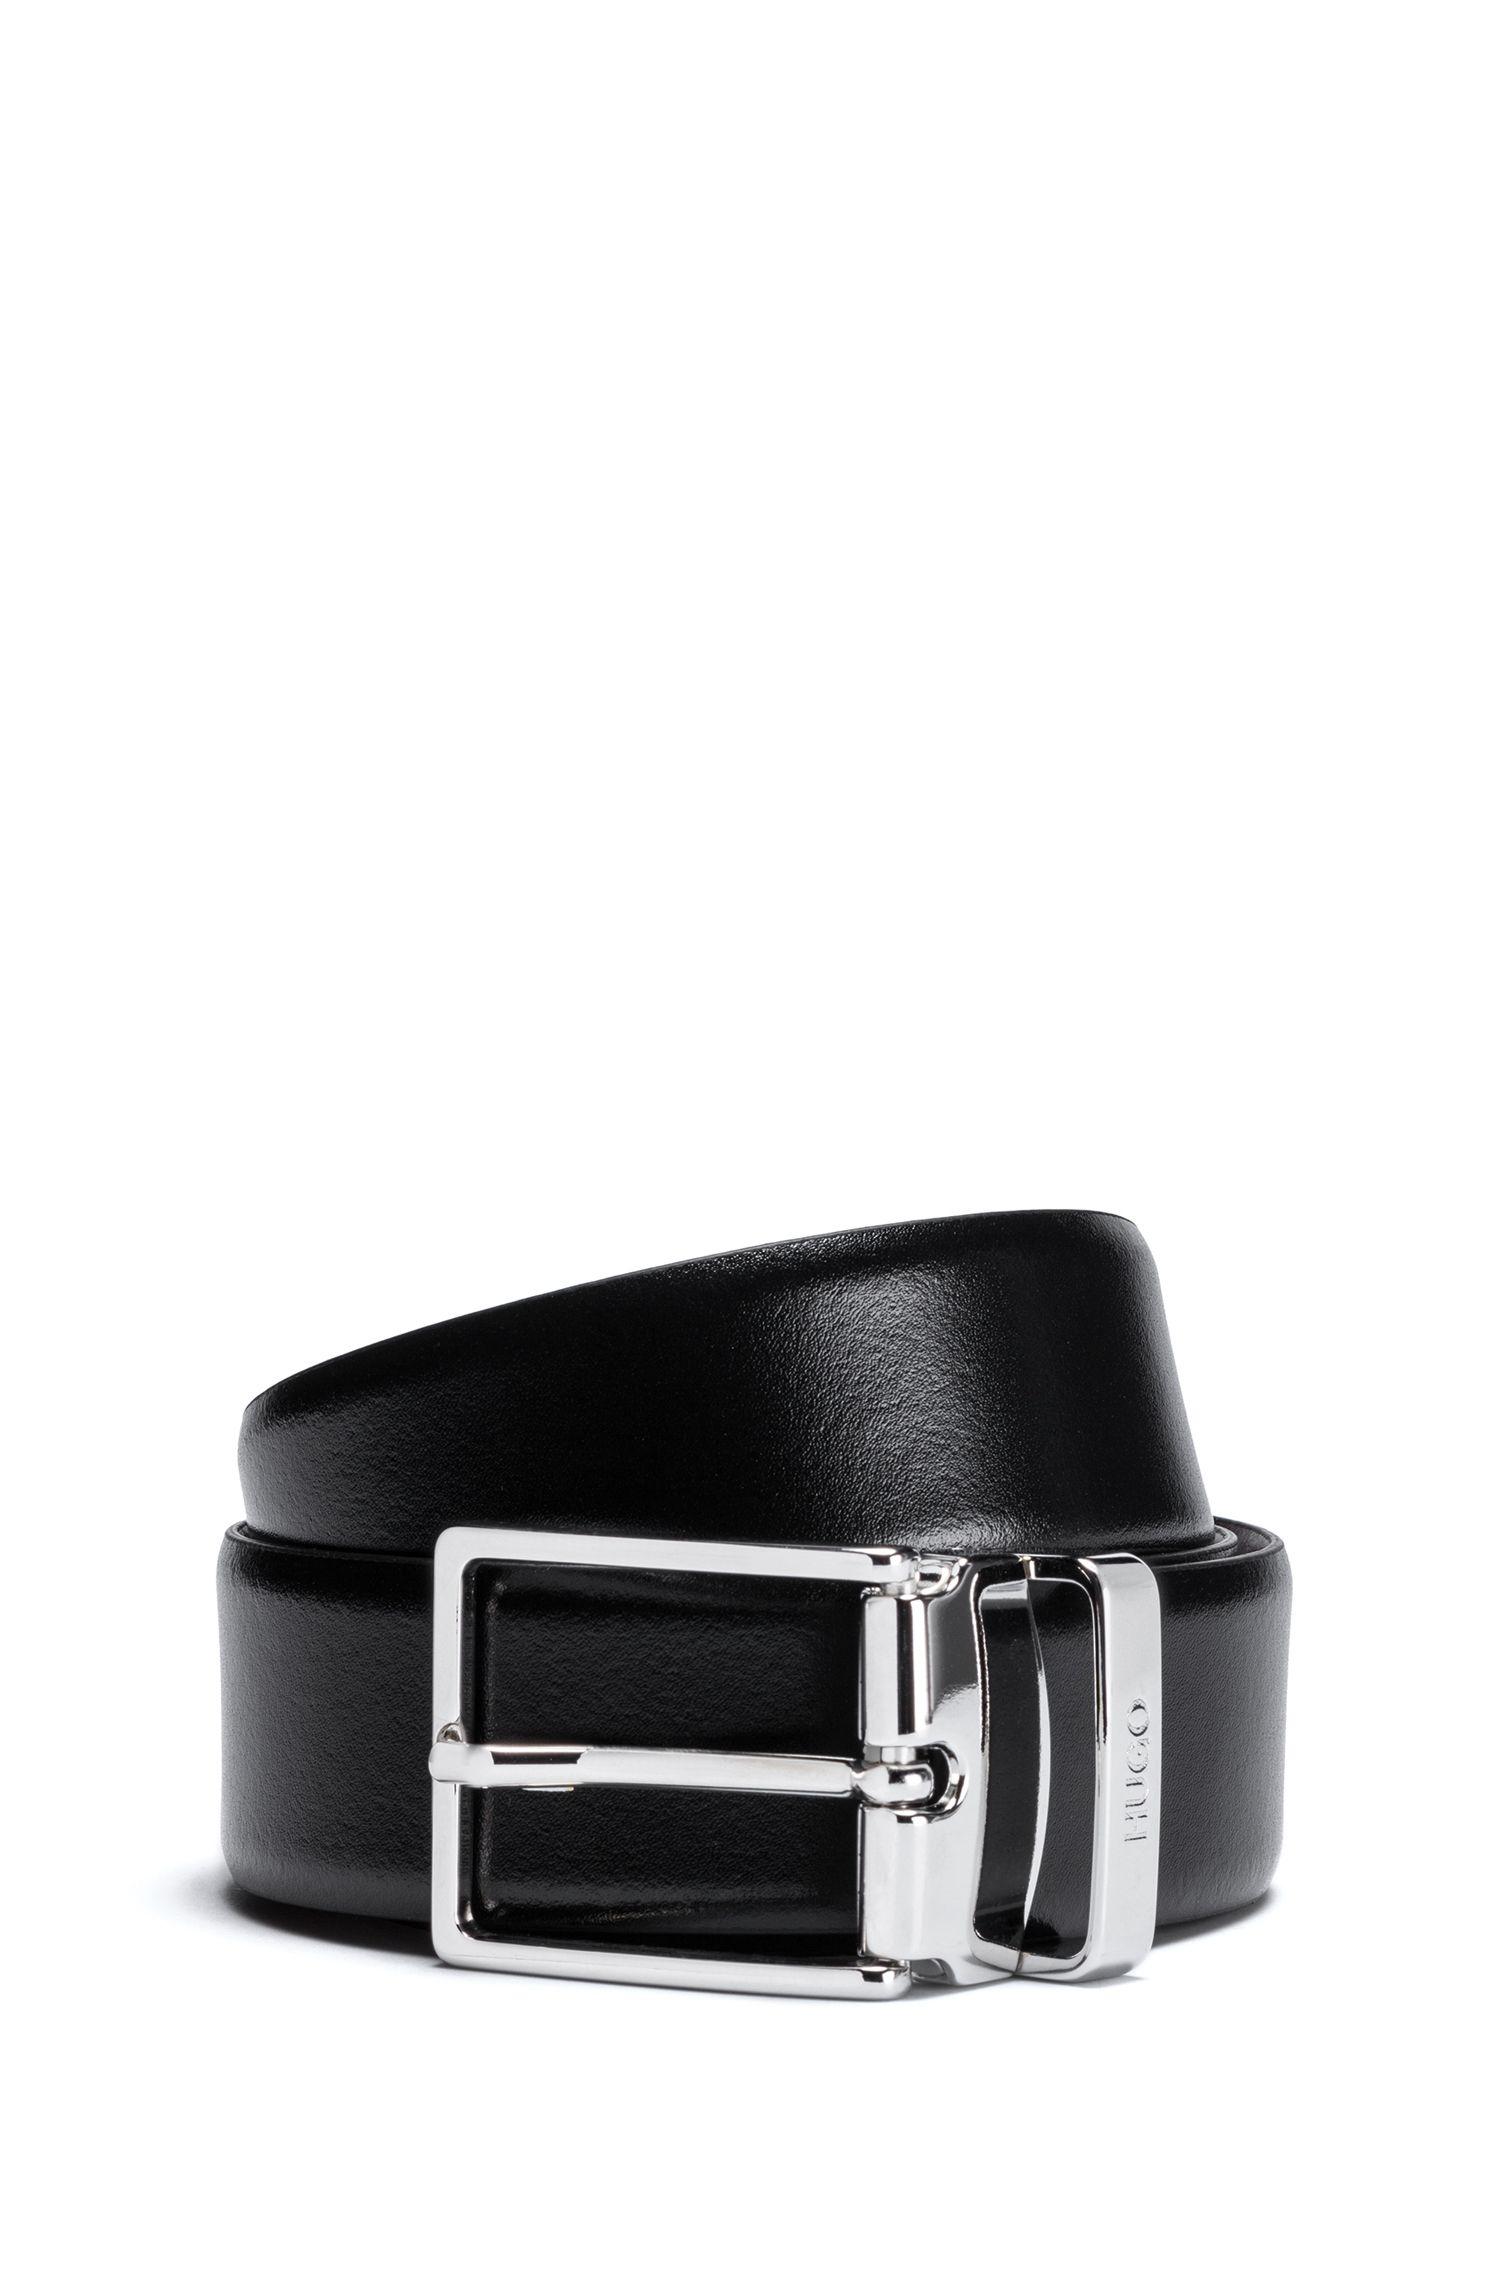 Reversible Leather Belt | Galvo Or35 pp, Black